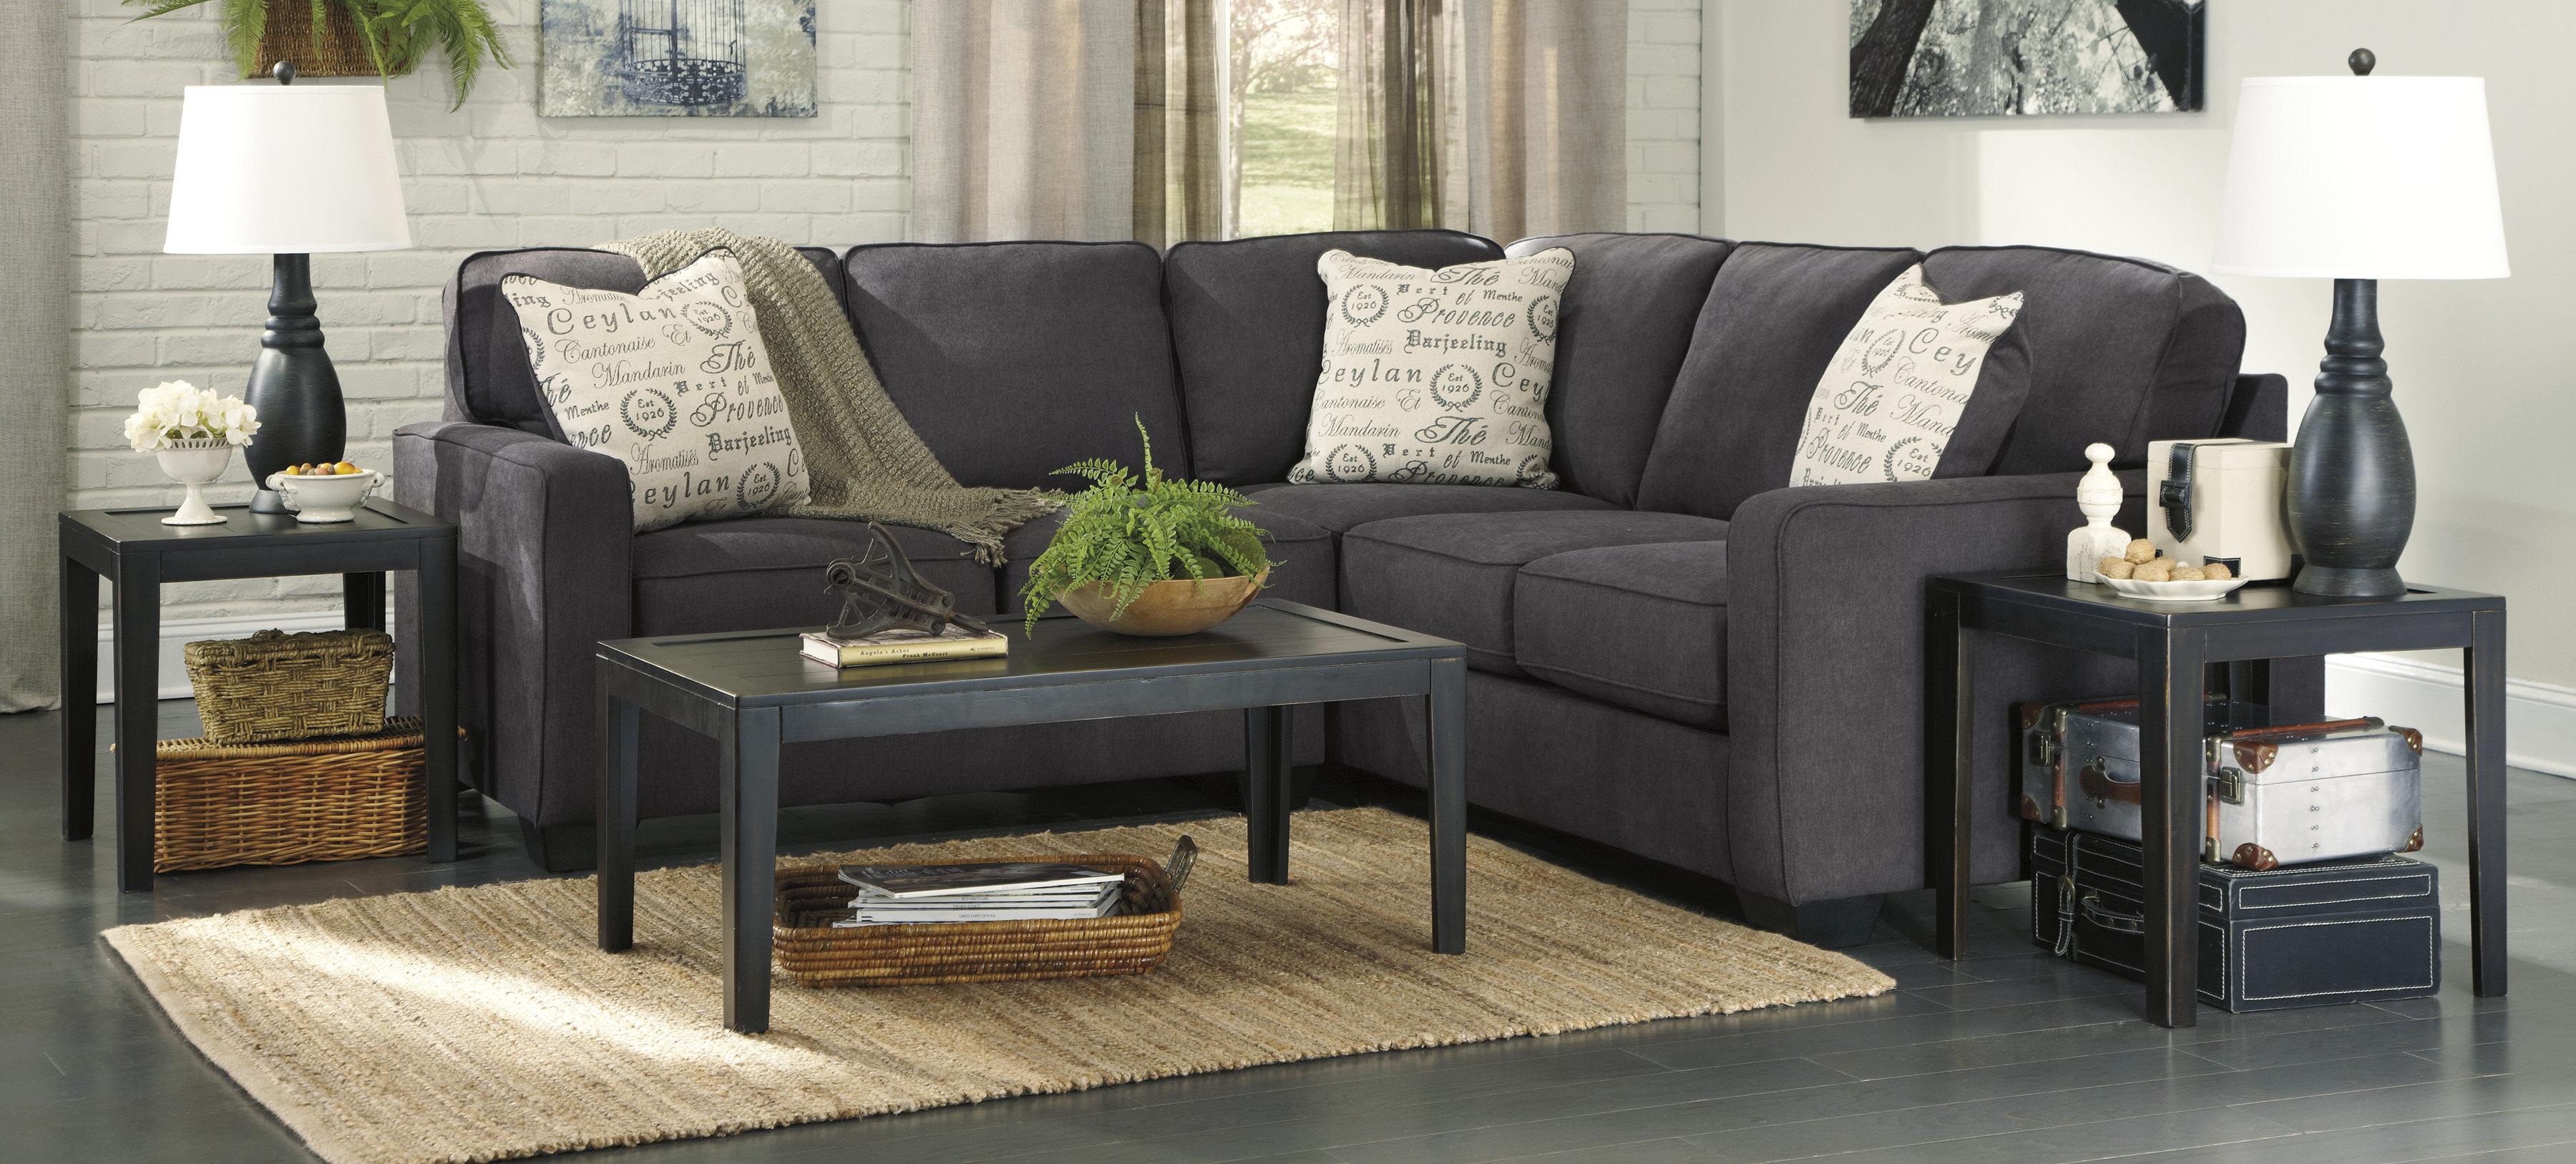 Complete Suite Furniture and Mattress - Spokane, WA Reviews, Ratings   Furniture Stores near 1219 N Division St , Spokane WA